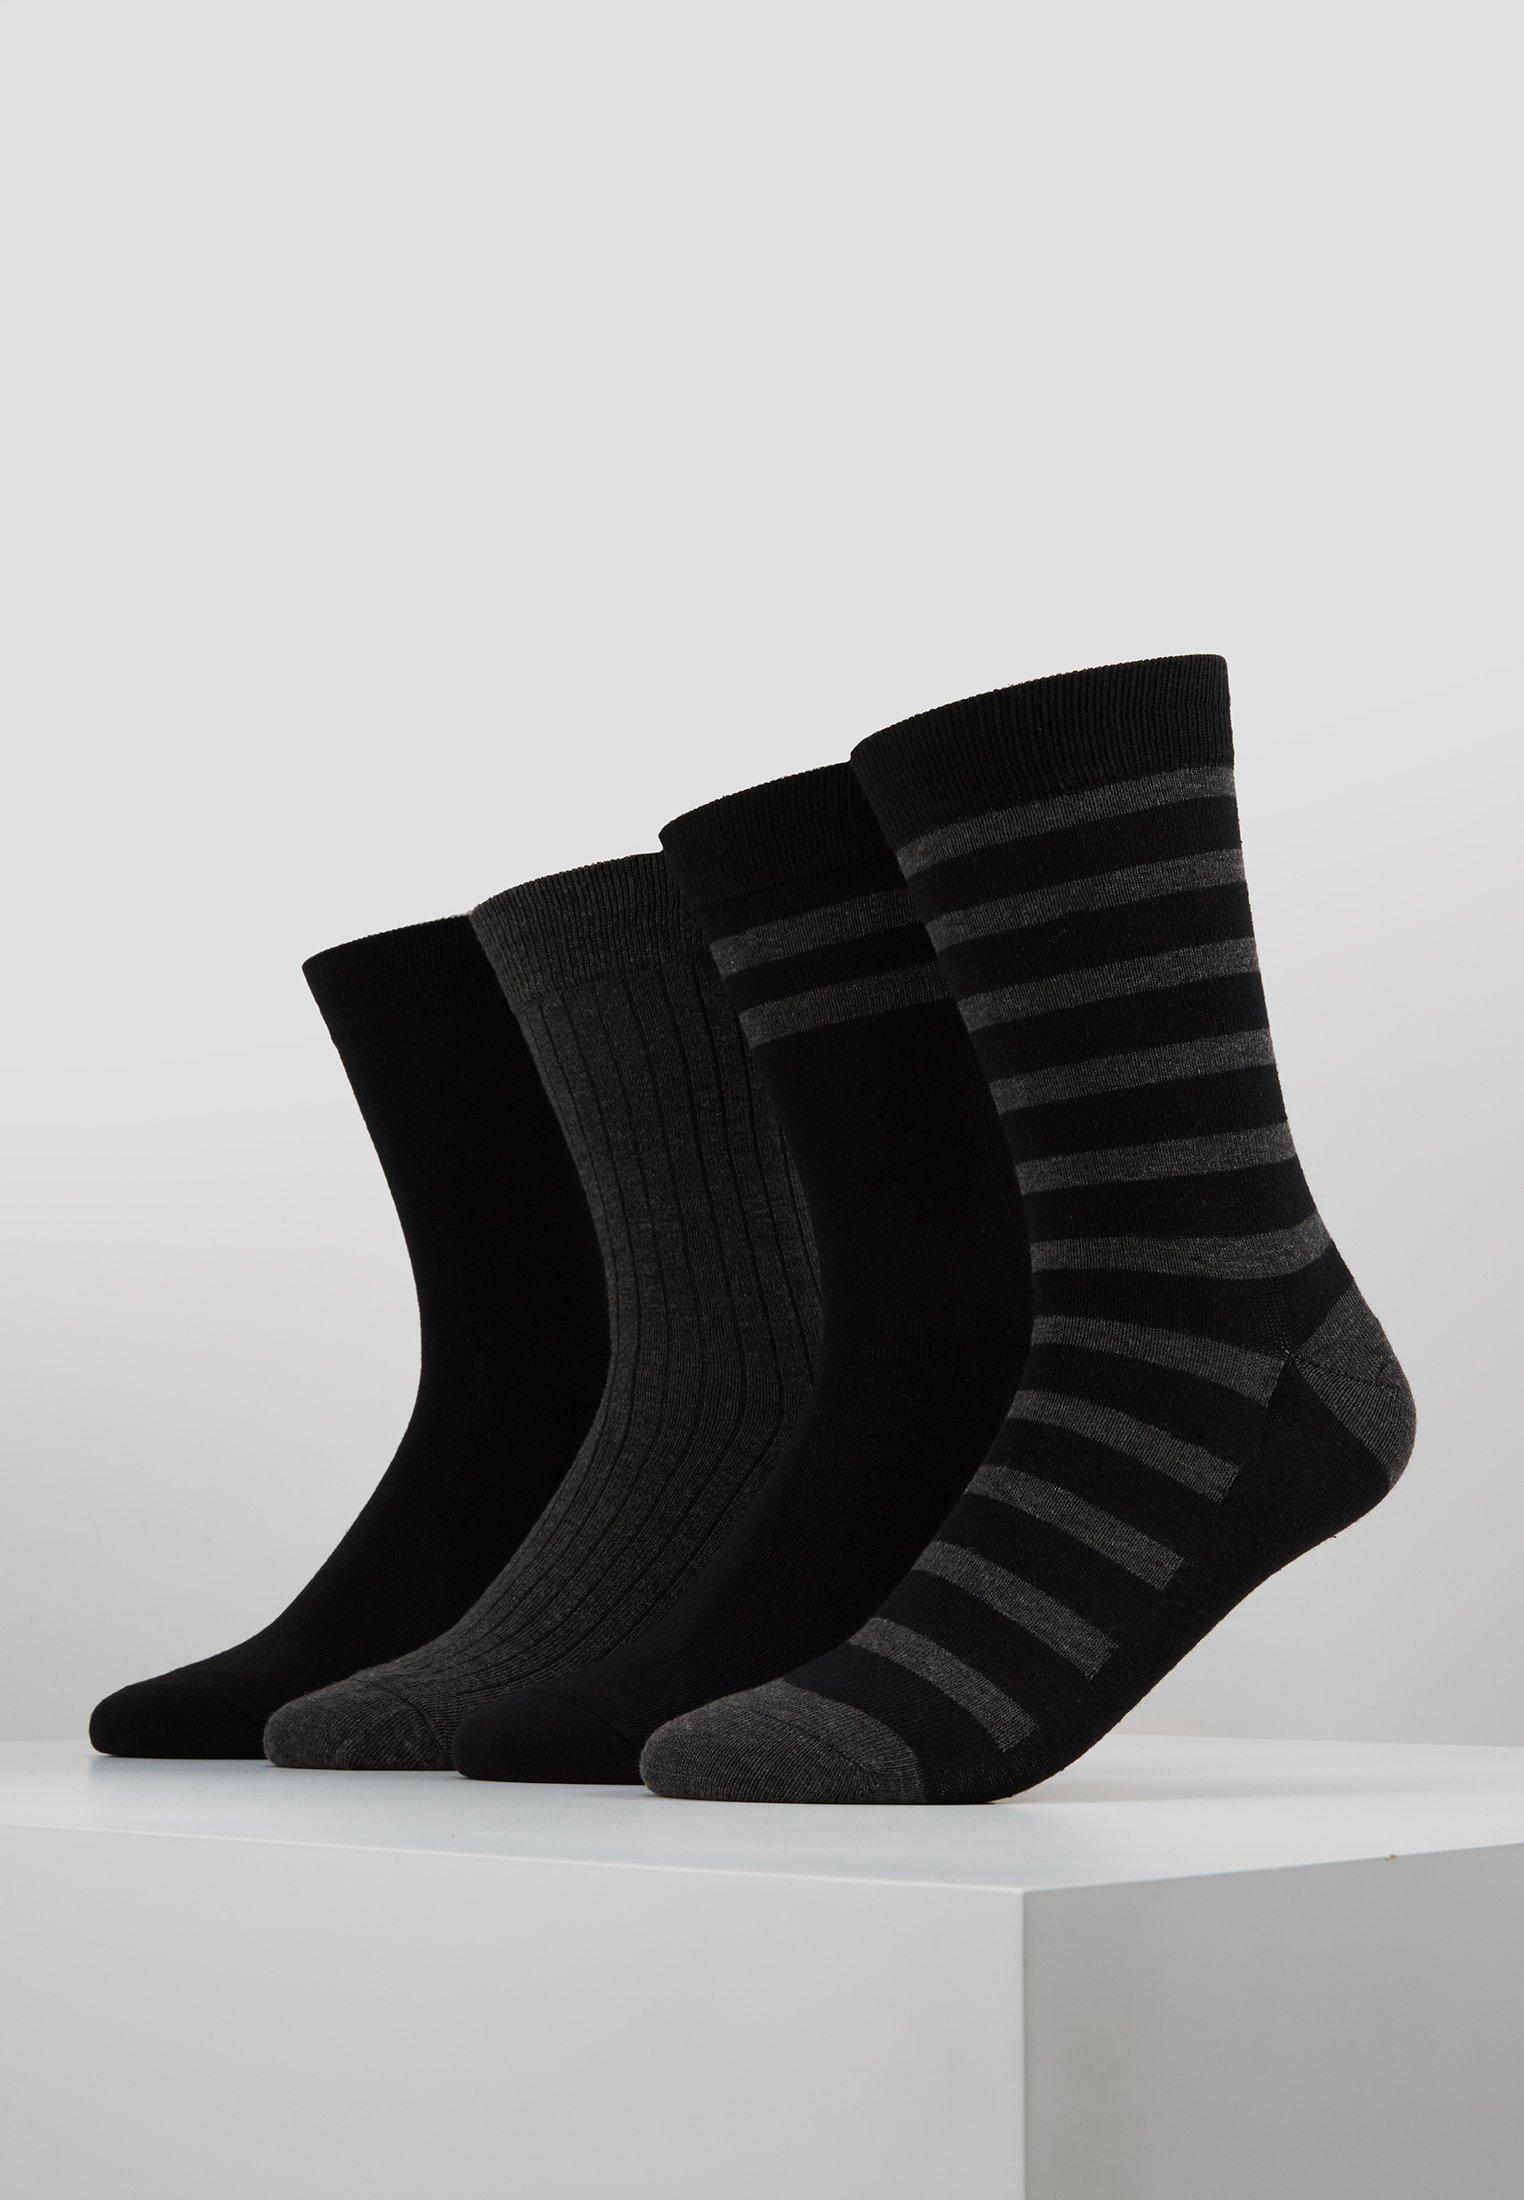 Men CREW SOCKS ECO DIM STYLE 4 PACK - Socks